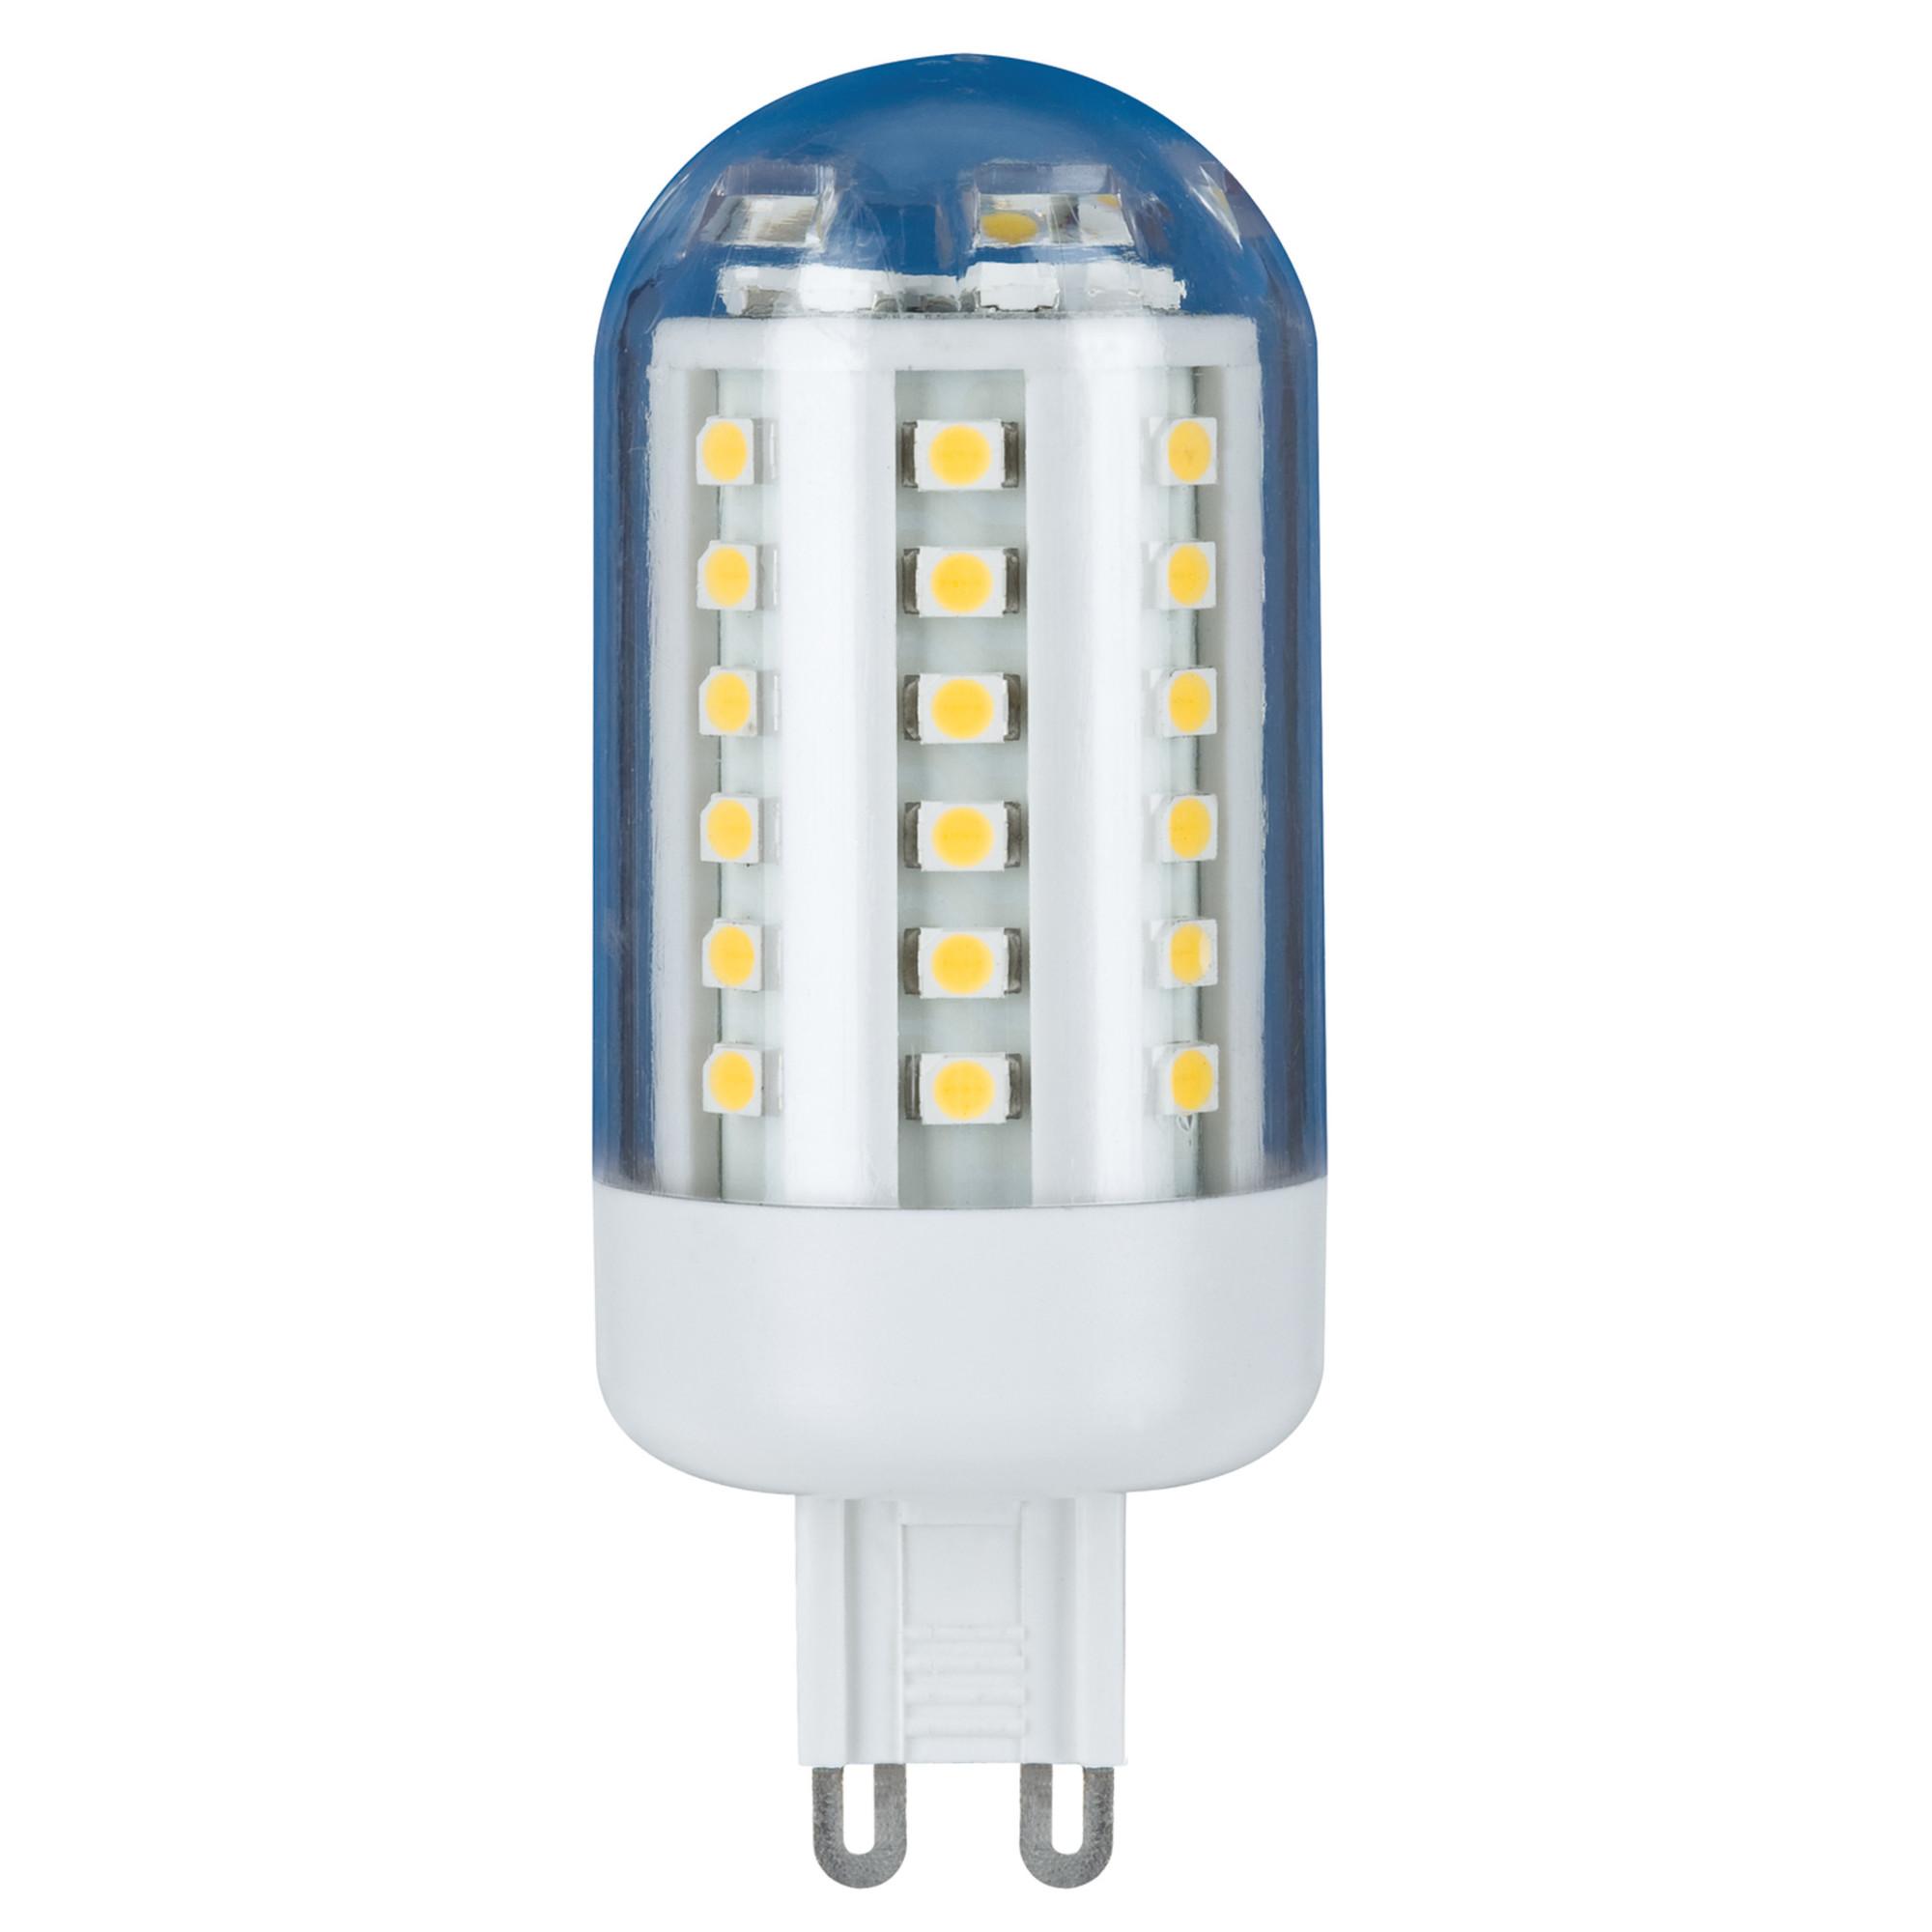 Лампа светодиодная Paulmann 28112 G9 250 Лм теплый свет